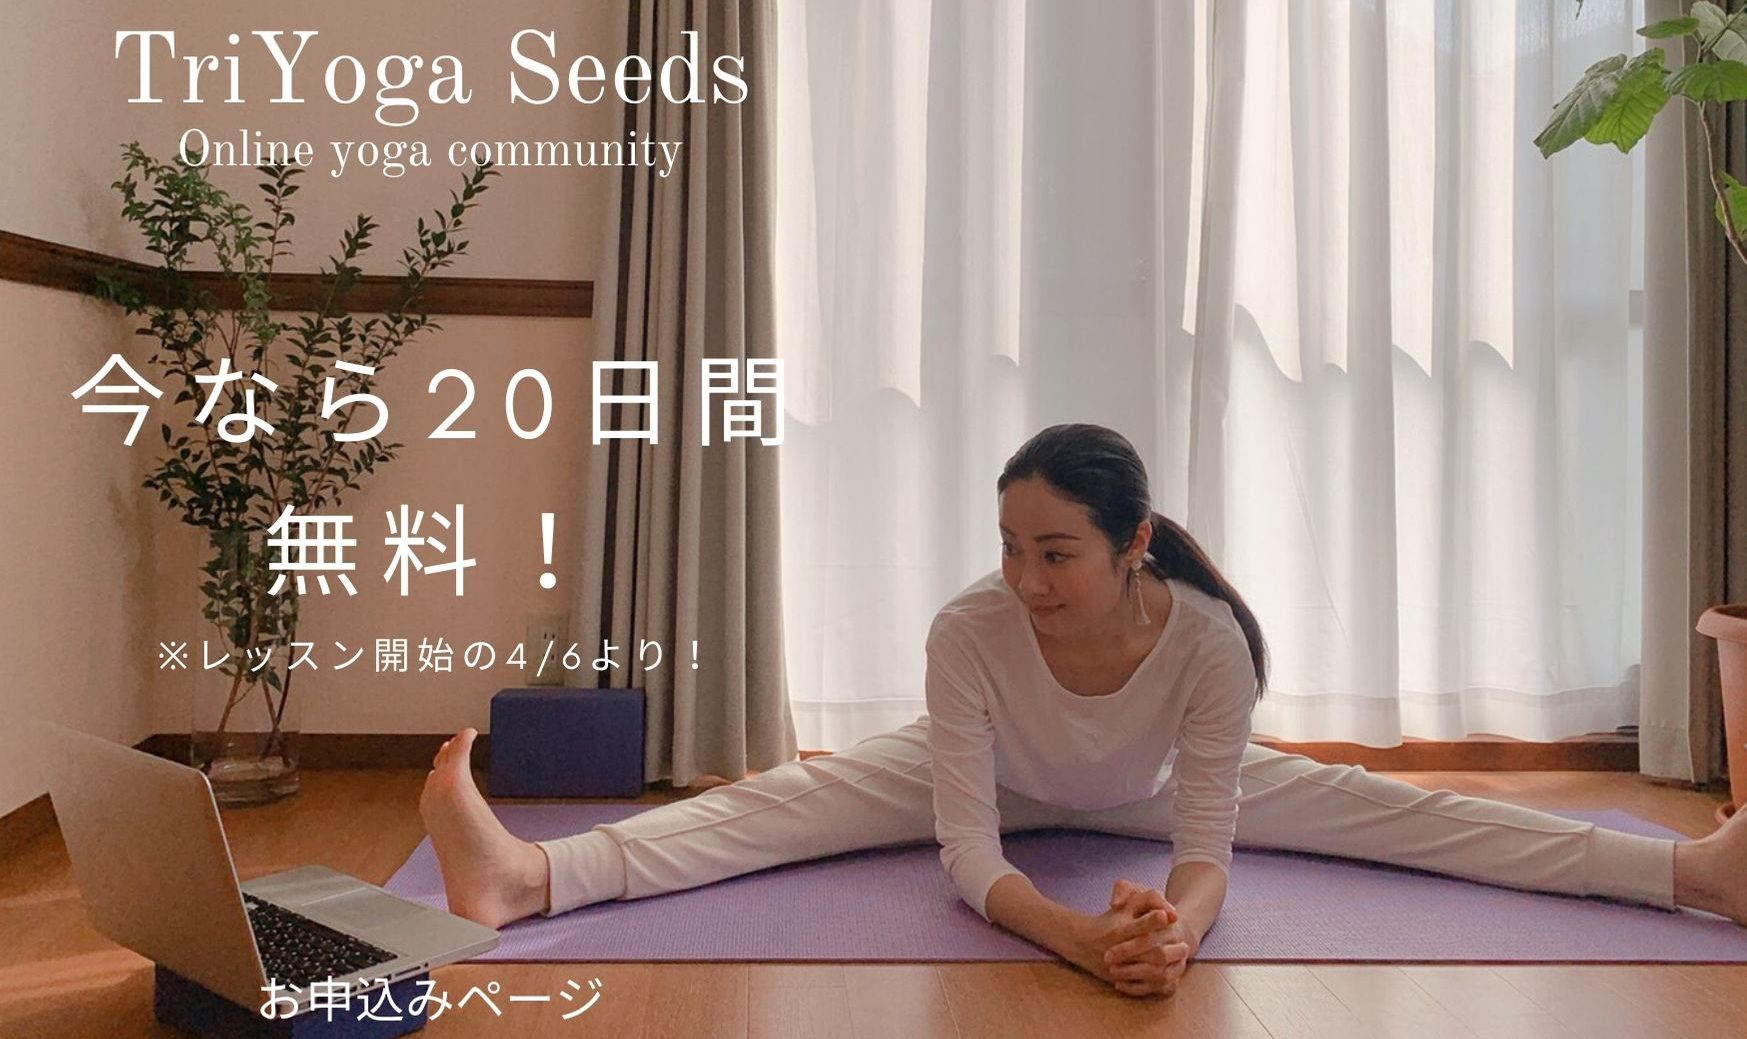 TriYoga Seeds